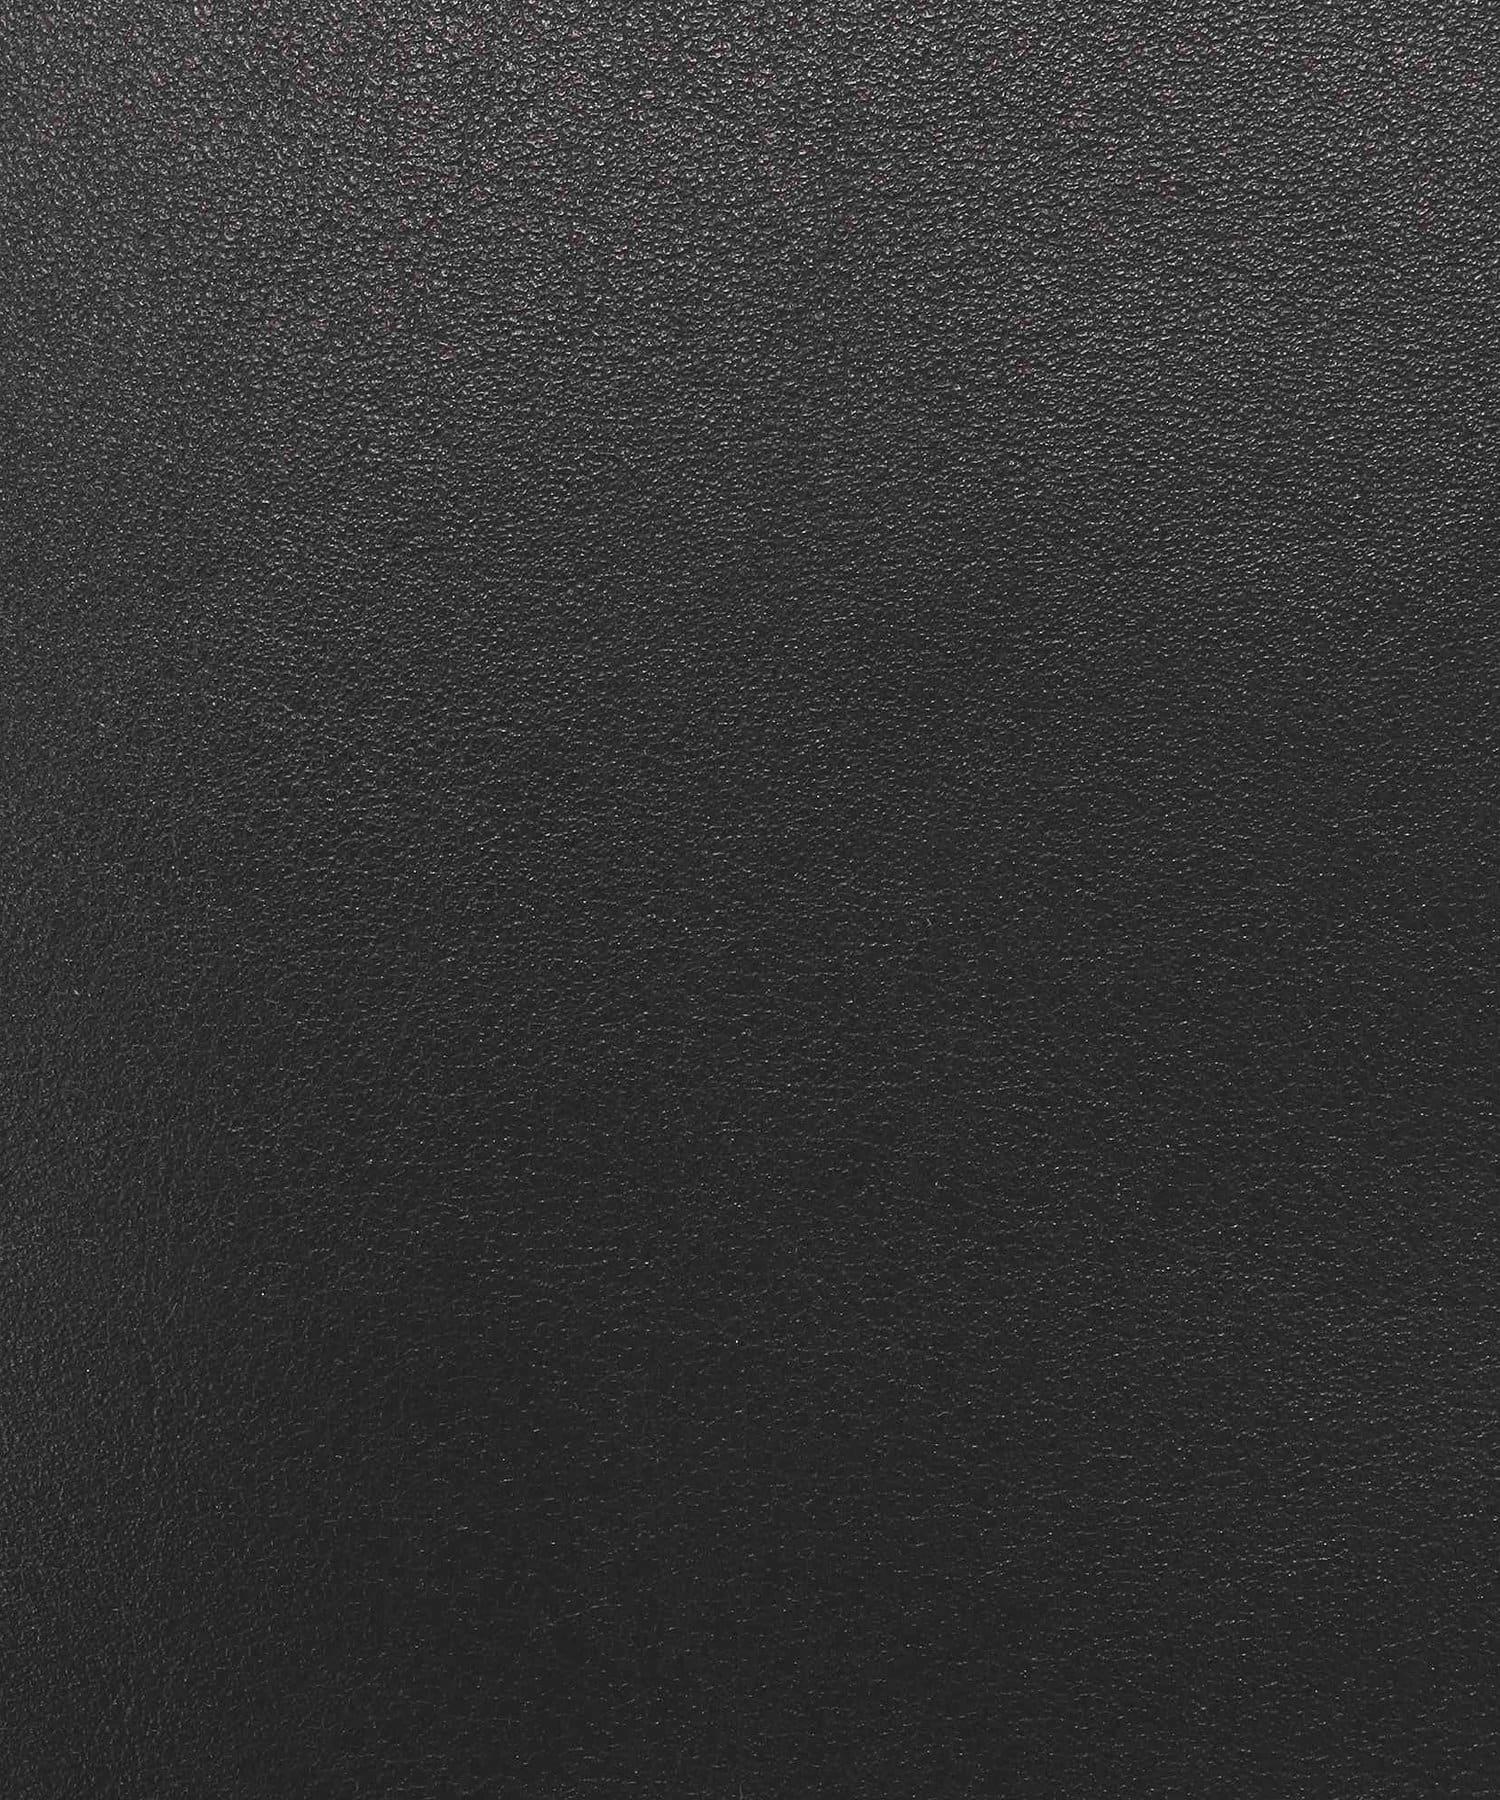 La boutique BonBon(ラブティックボンボン) 【ORSETTO(オルセット)】METALLO バッグ